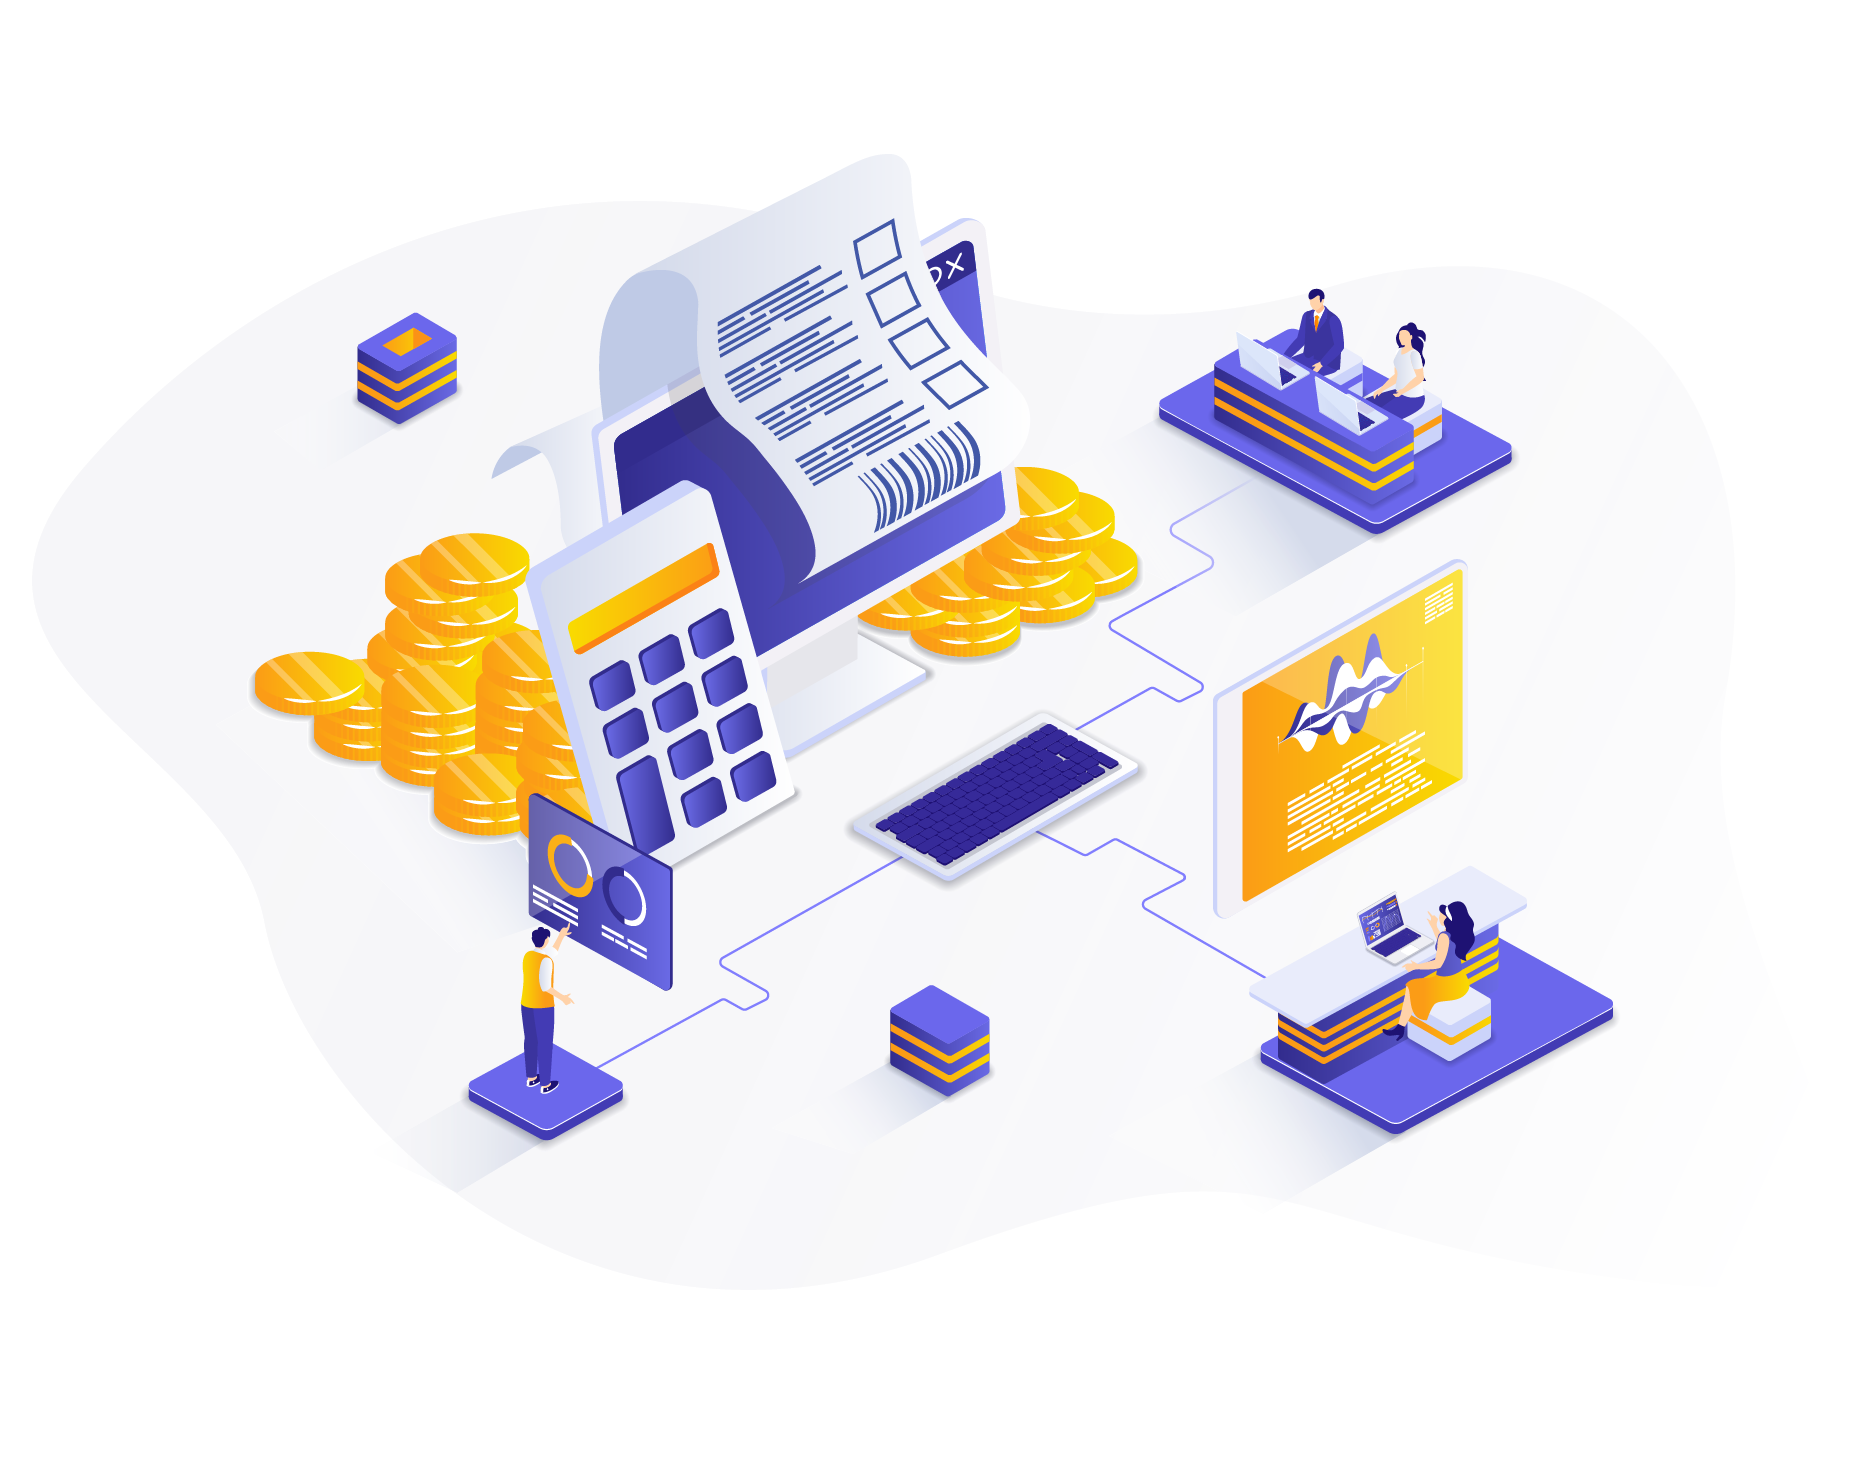 Jade-Digital_Application-Modernisation_Automated-Digital_Graphic-01